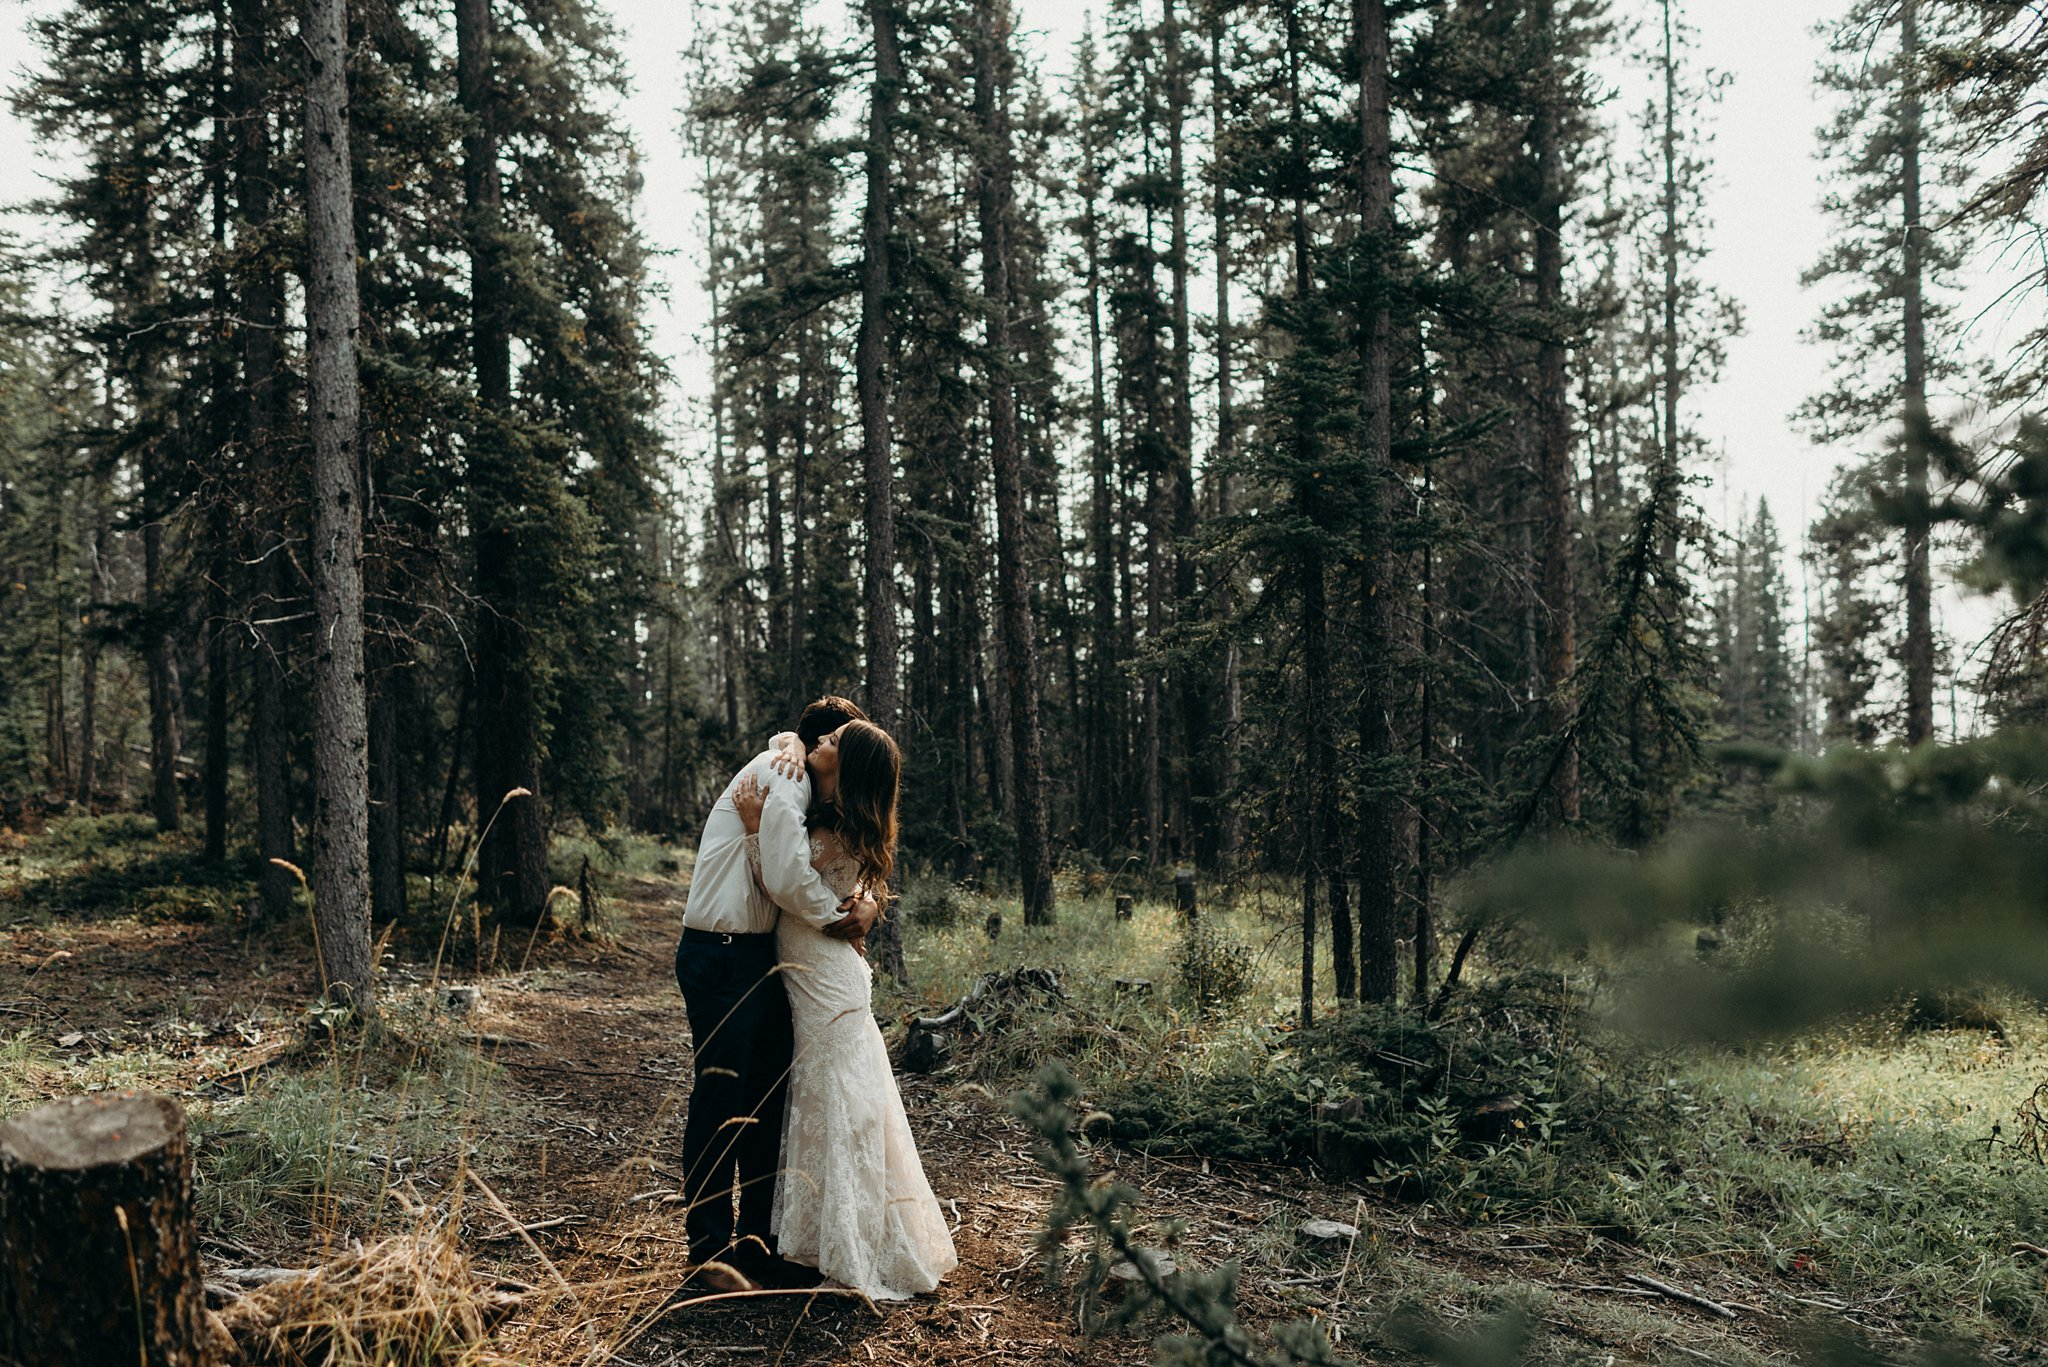 kaihla_tonai_intimate_wedding_elopement_photographer_6714.jpg